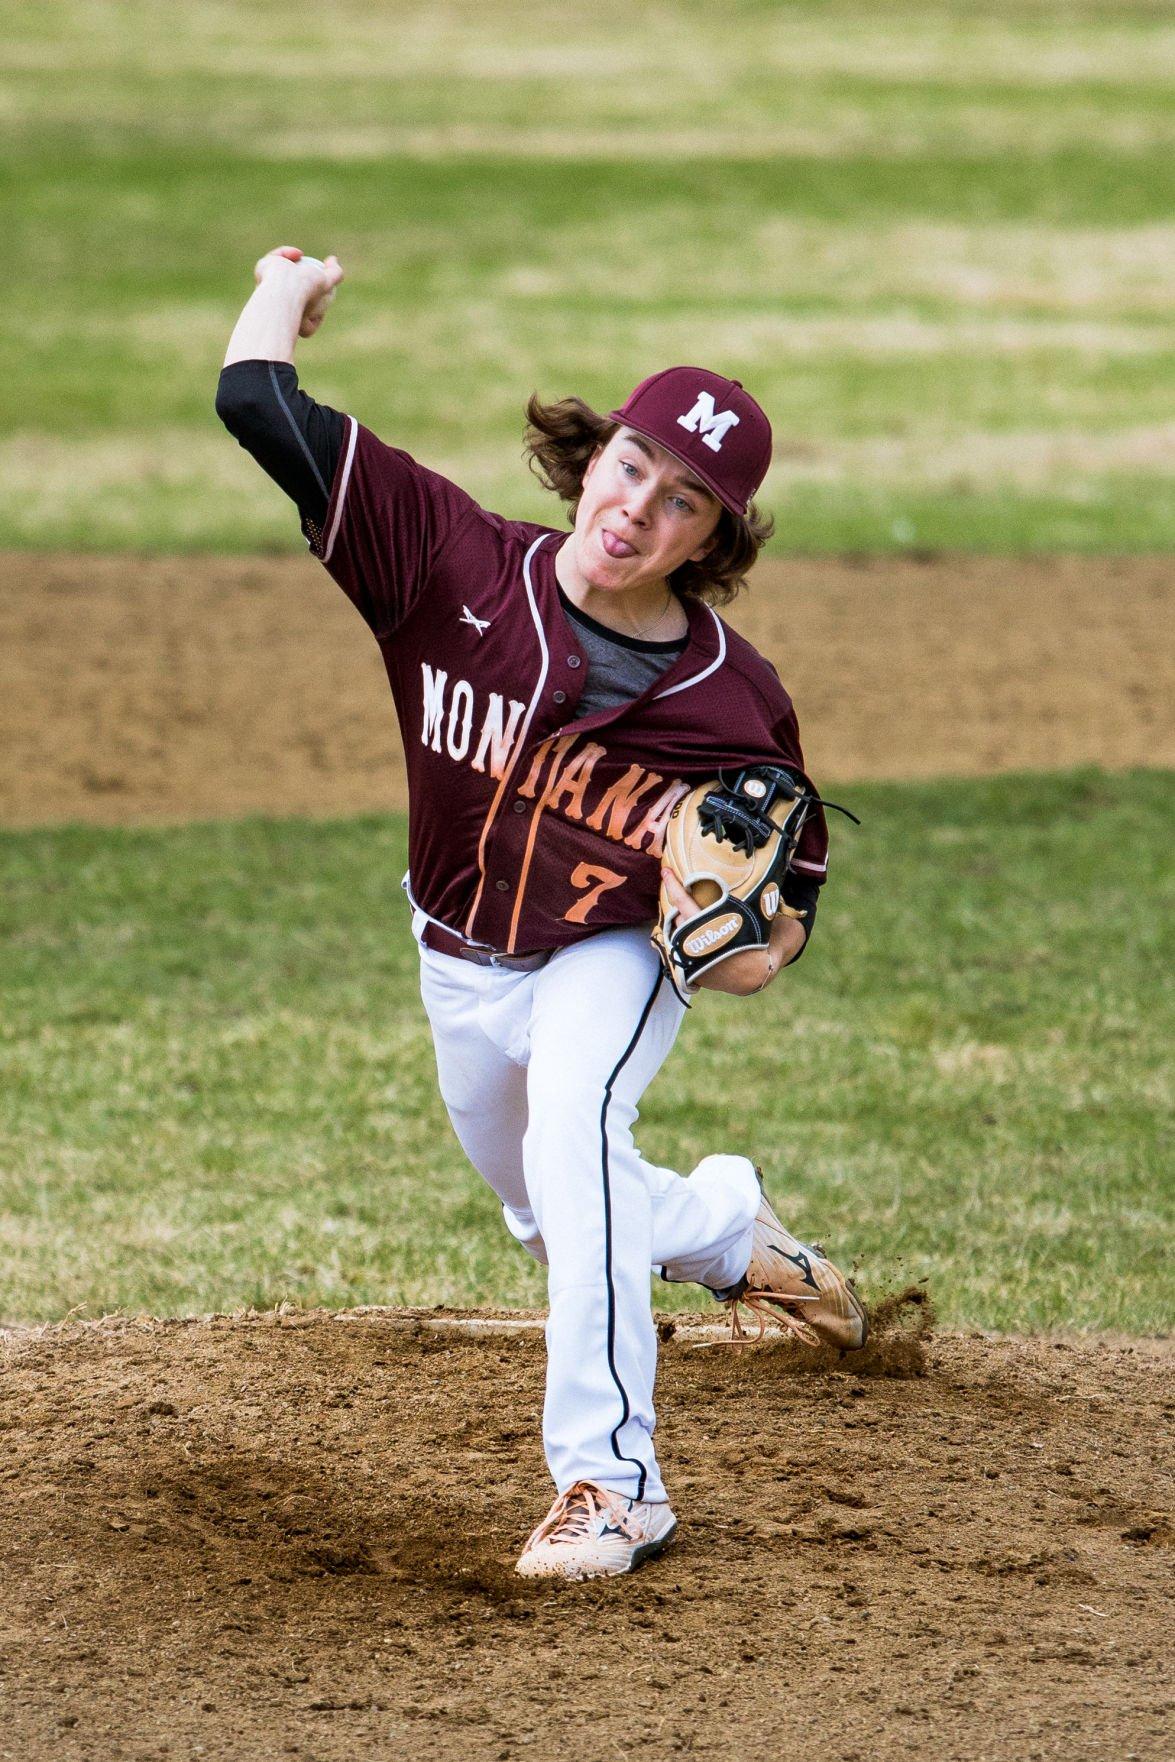 BaseballUMvEWU_Wiggins-1.JPG